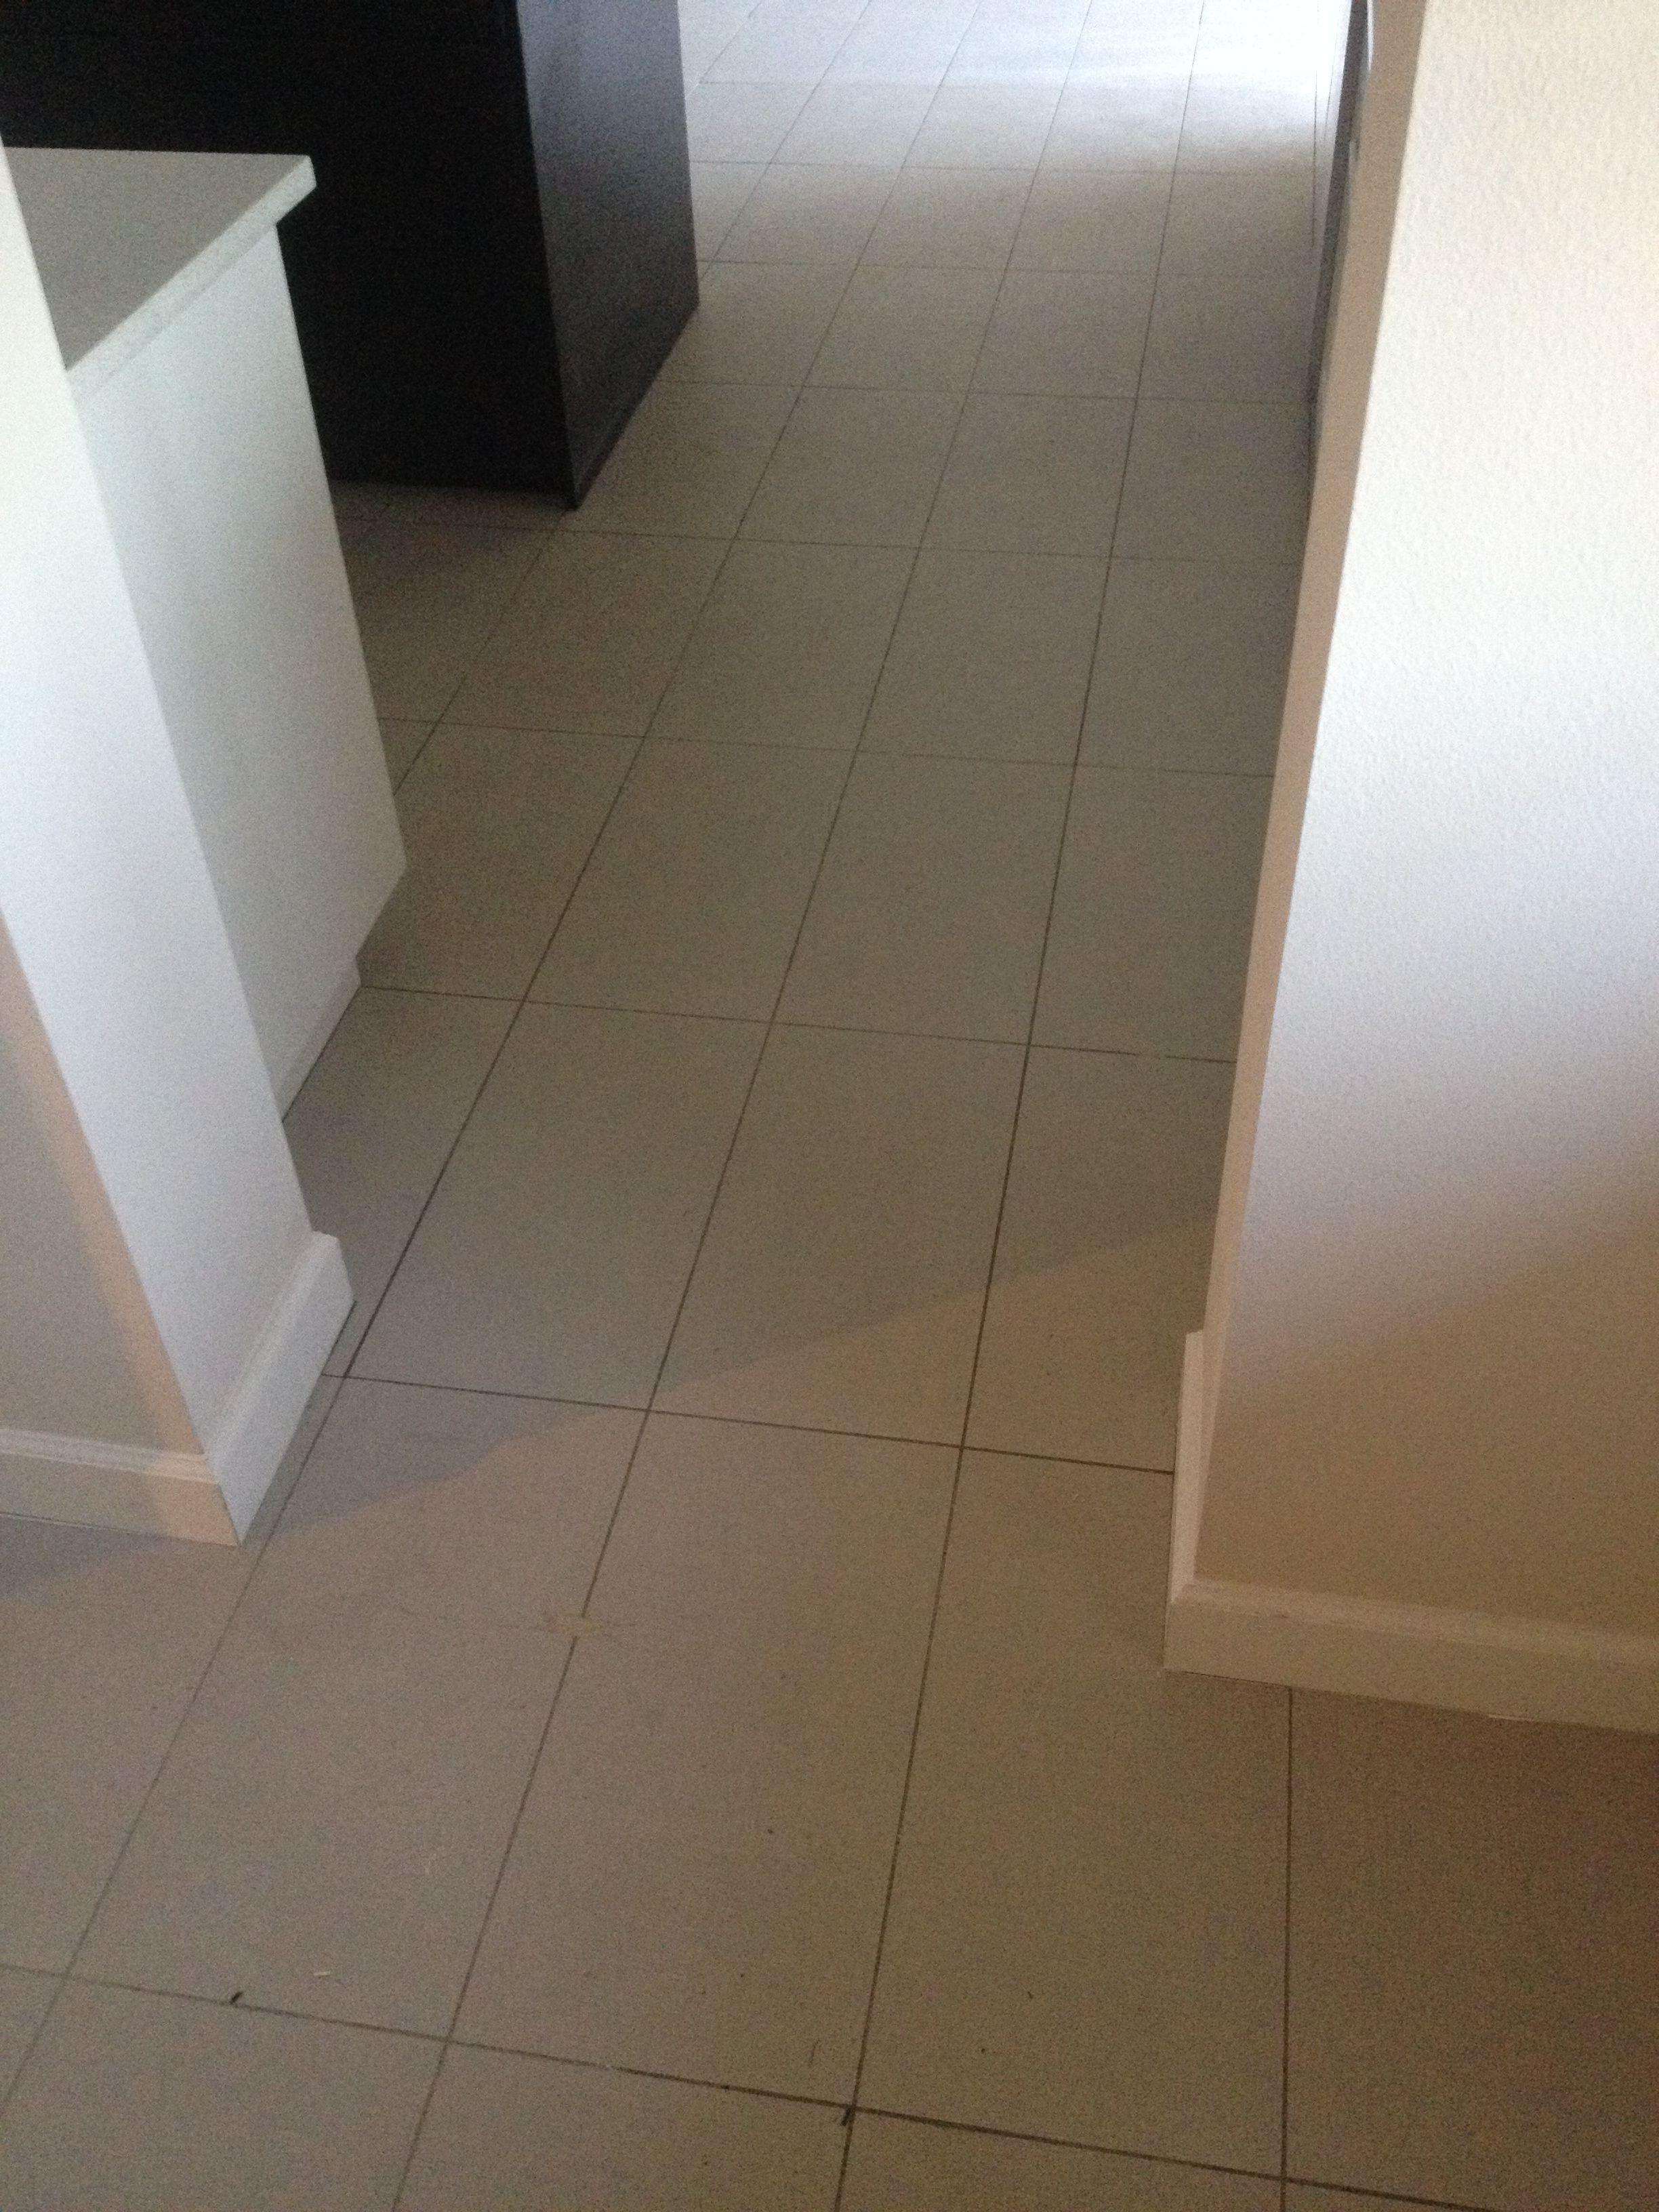 12 x 24 porcelain tile straight lay